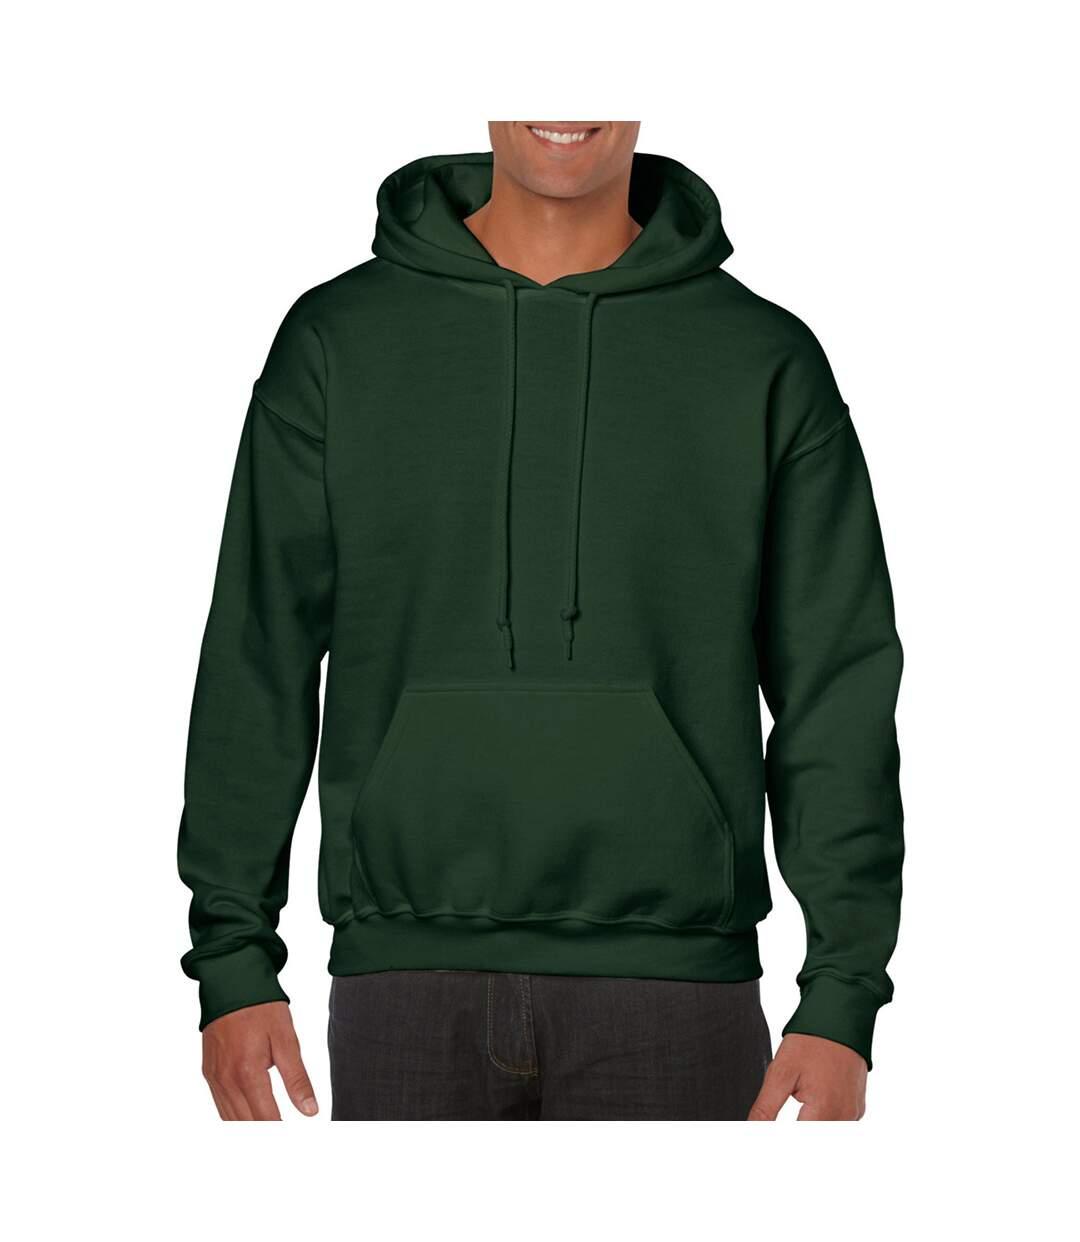 Gildan - Sweatshirt À Capuche - Unisexe (Vert foncé) - UTBC468